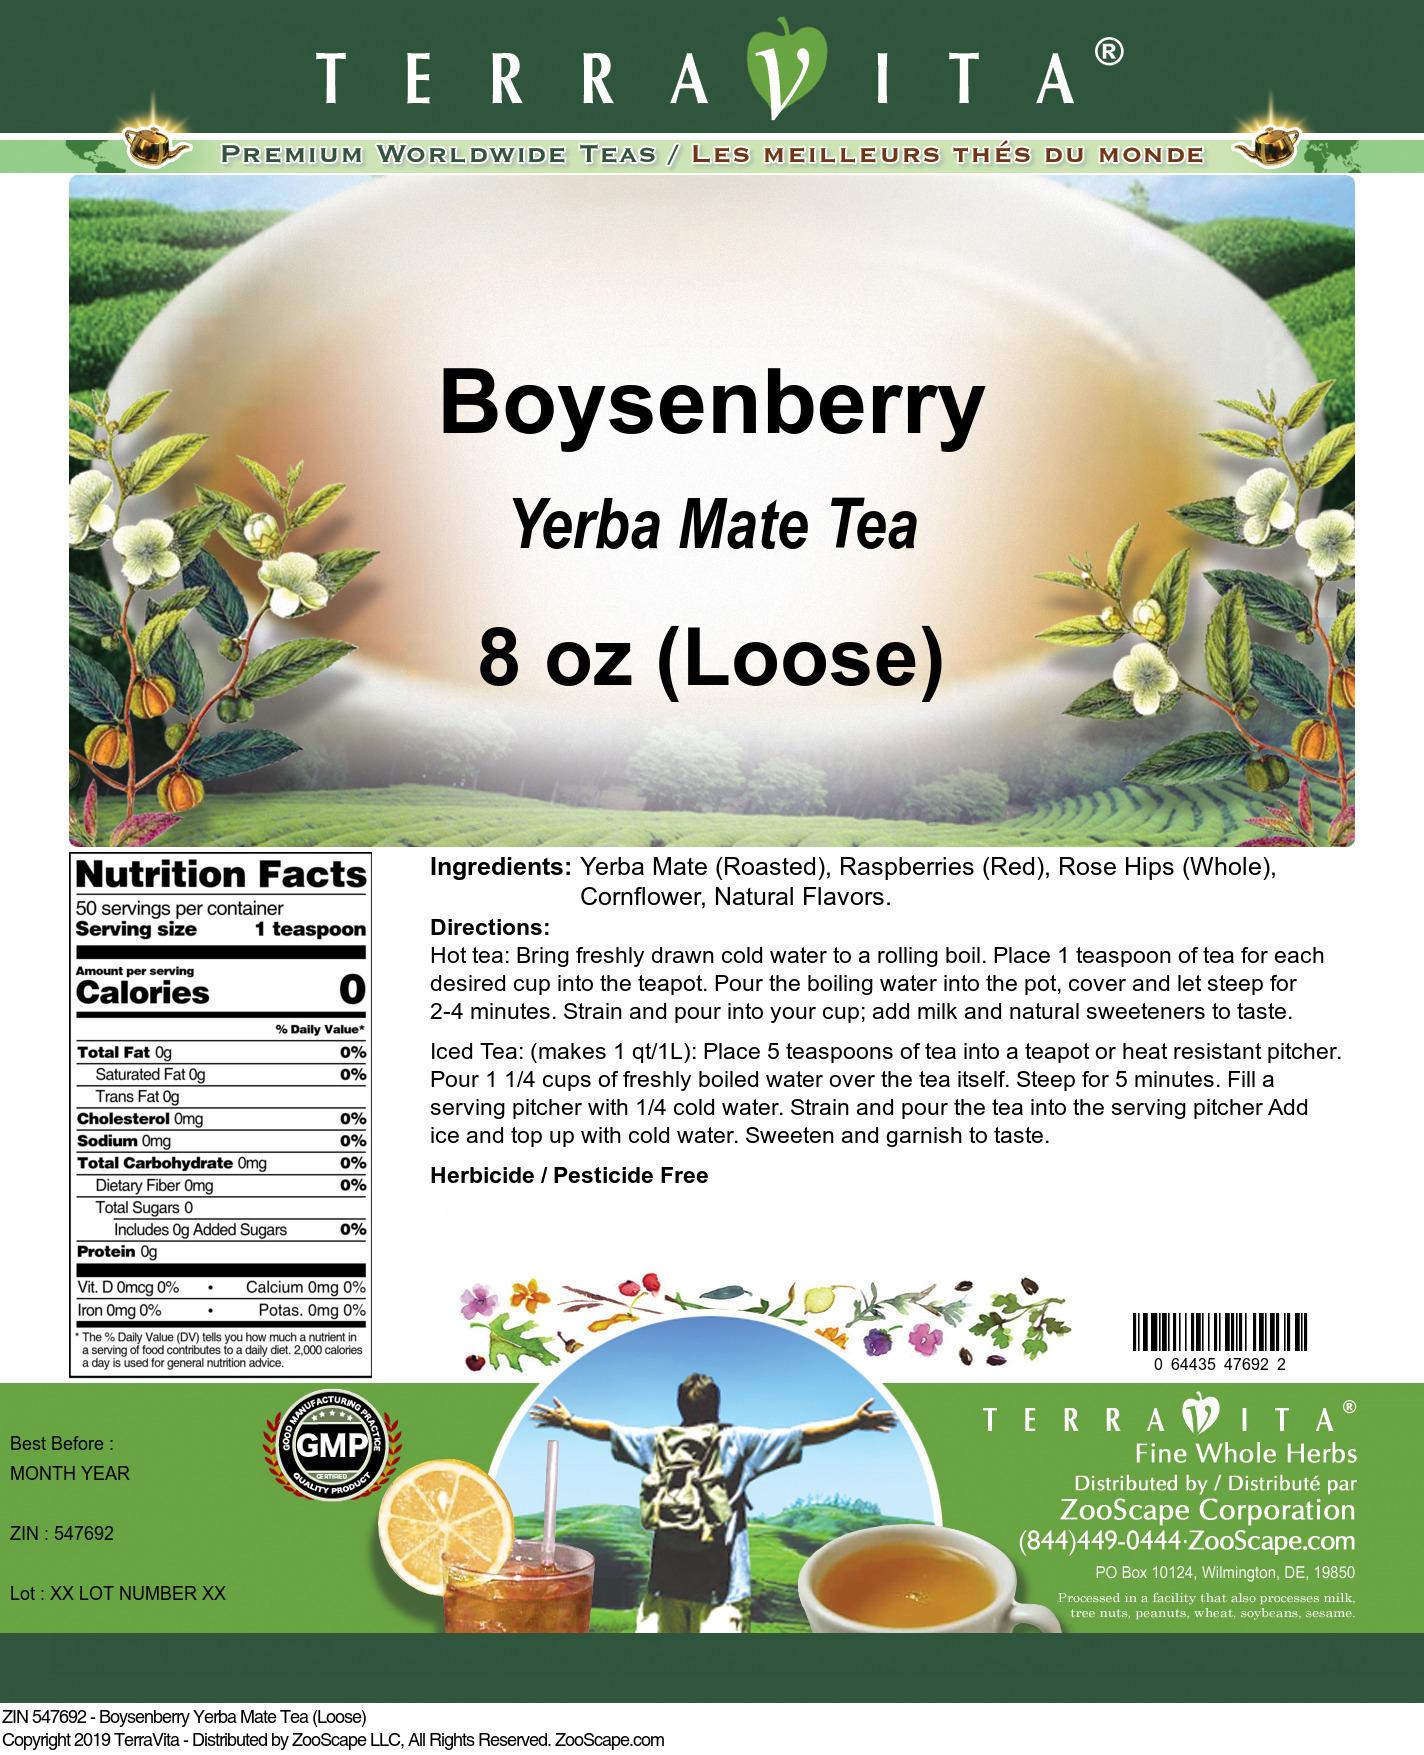 Boysenberry Yerba Mate Tea (Loose)